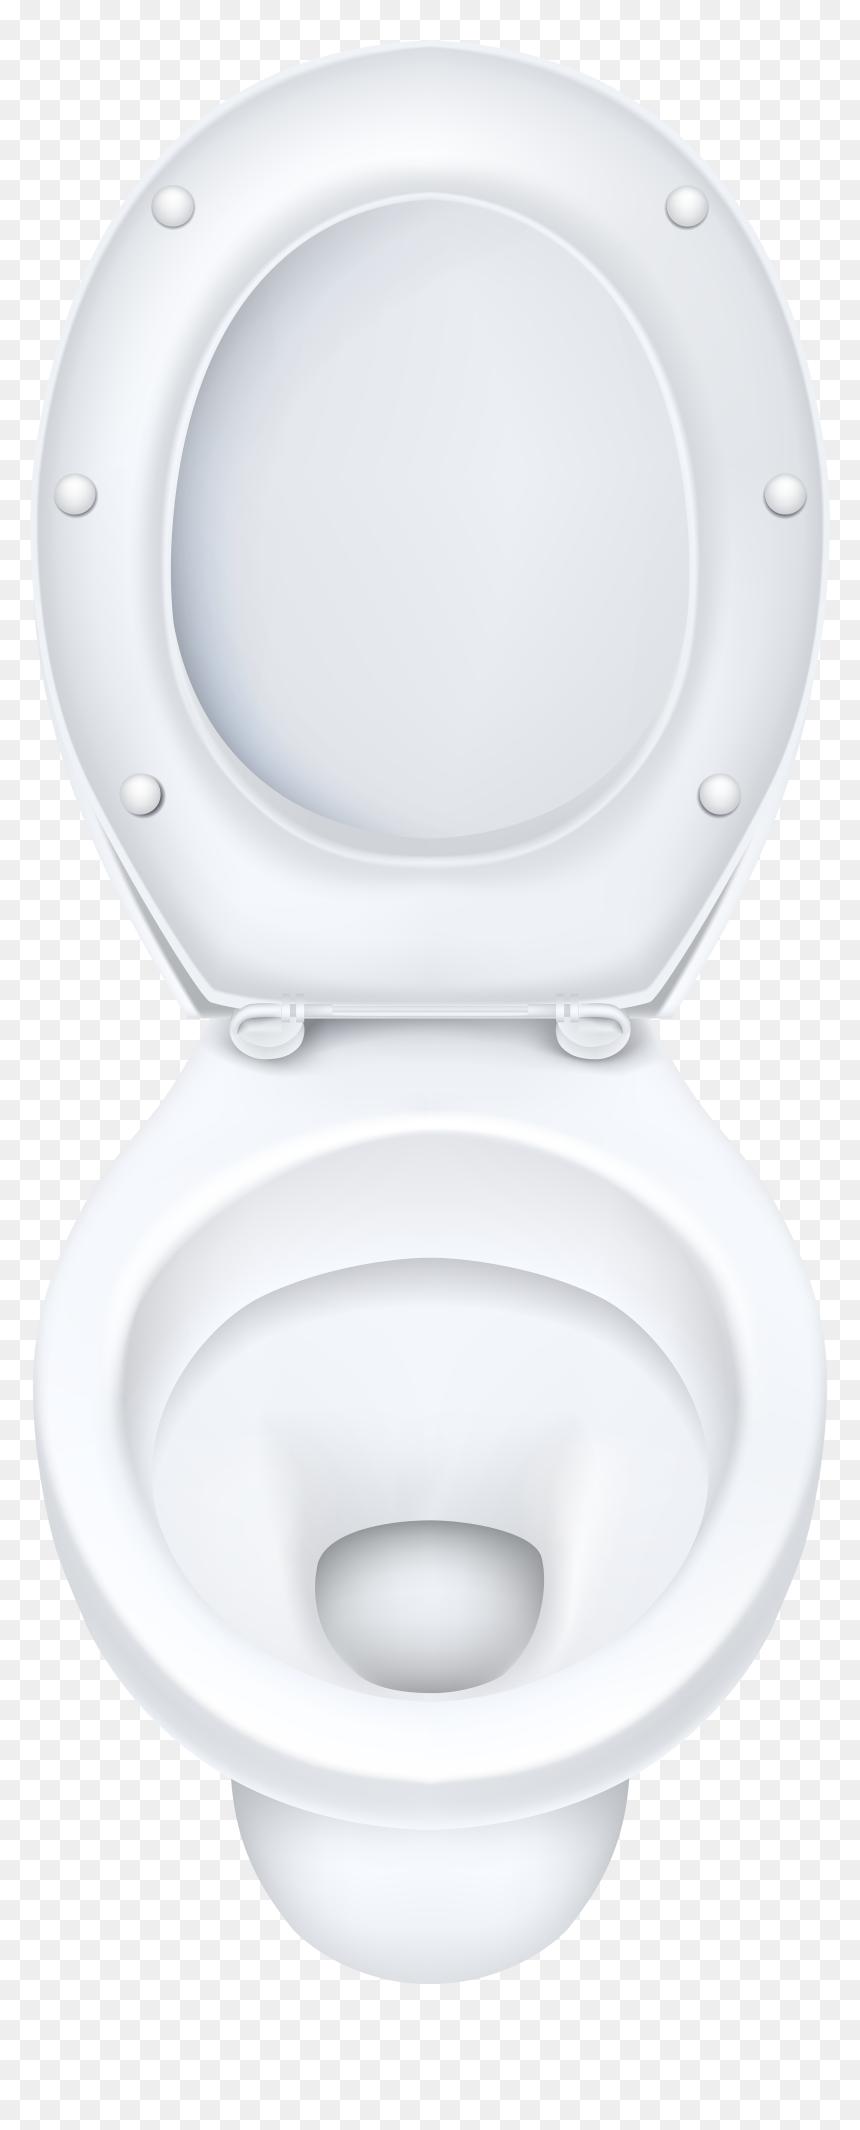 white toilet bowl png clip art toilet bowl clipart transparent png vhv white toilet bowl png clip art toilet